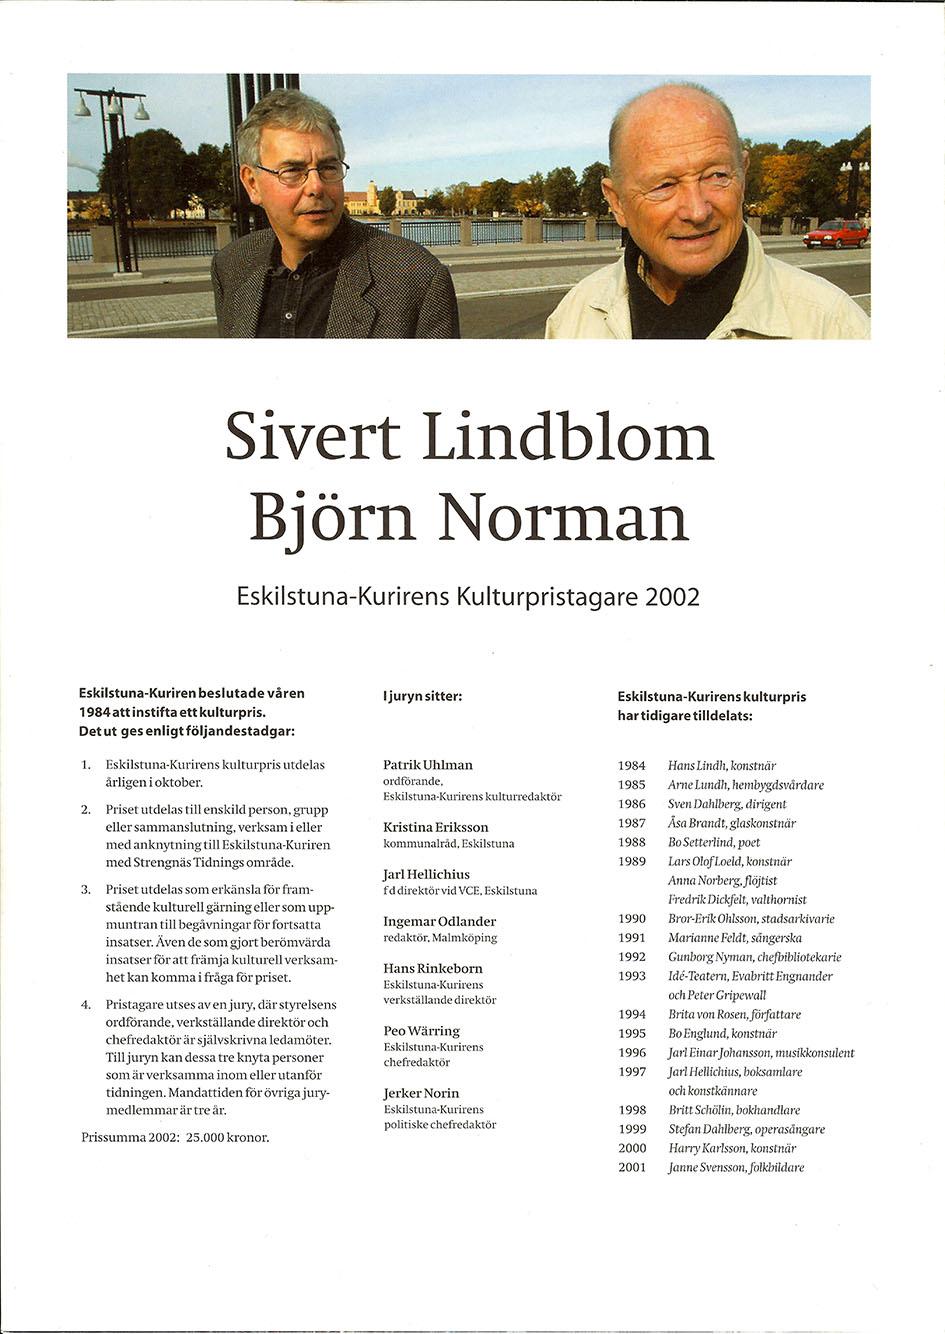 Sivert Lindblom Eskilstuna Kuriren Kulturpris 4-